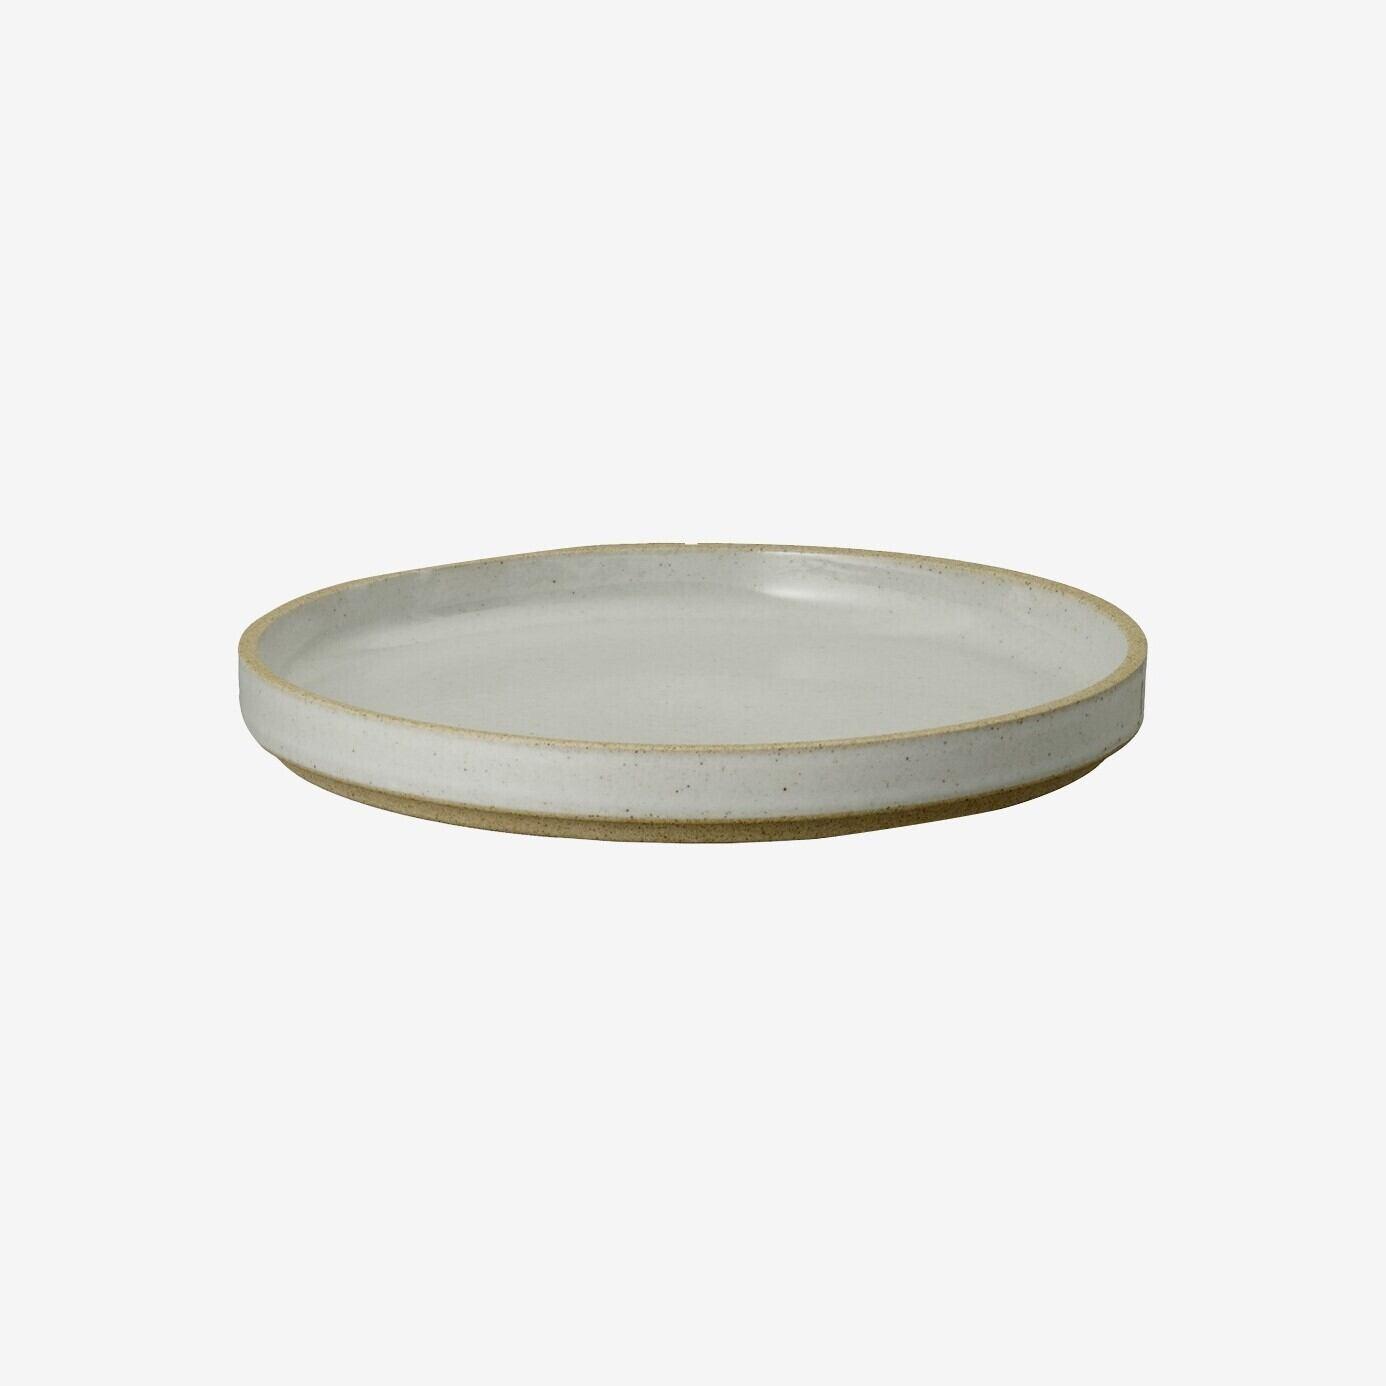 HASAMI PORCELAIN (ハサミポーセリン) Plate (Clear / グレー) 【145x21】HPM002